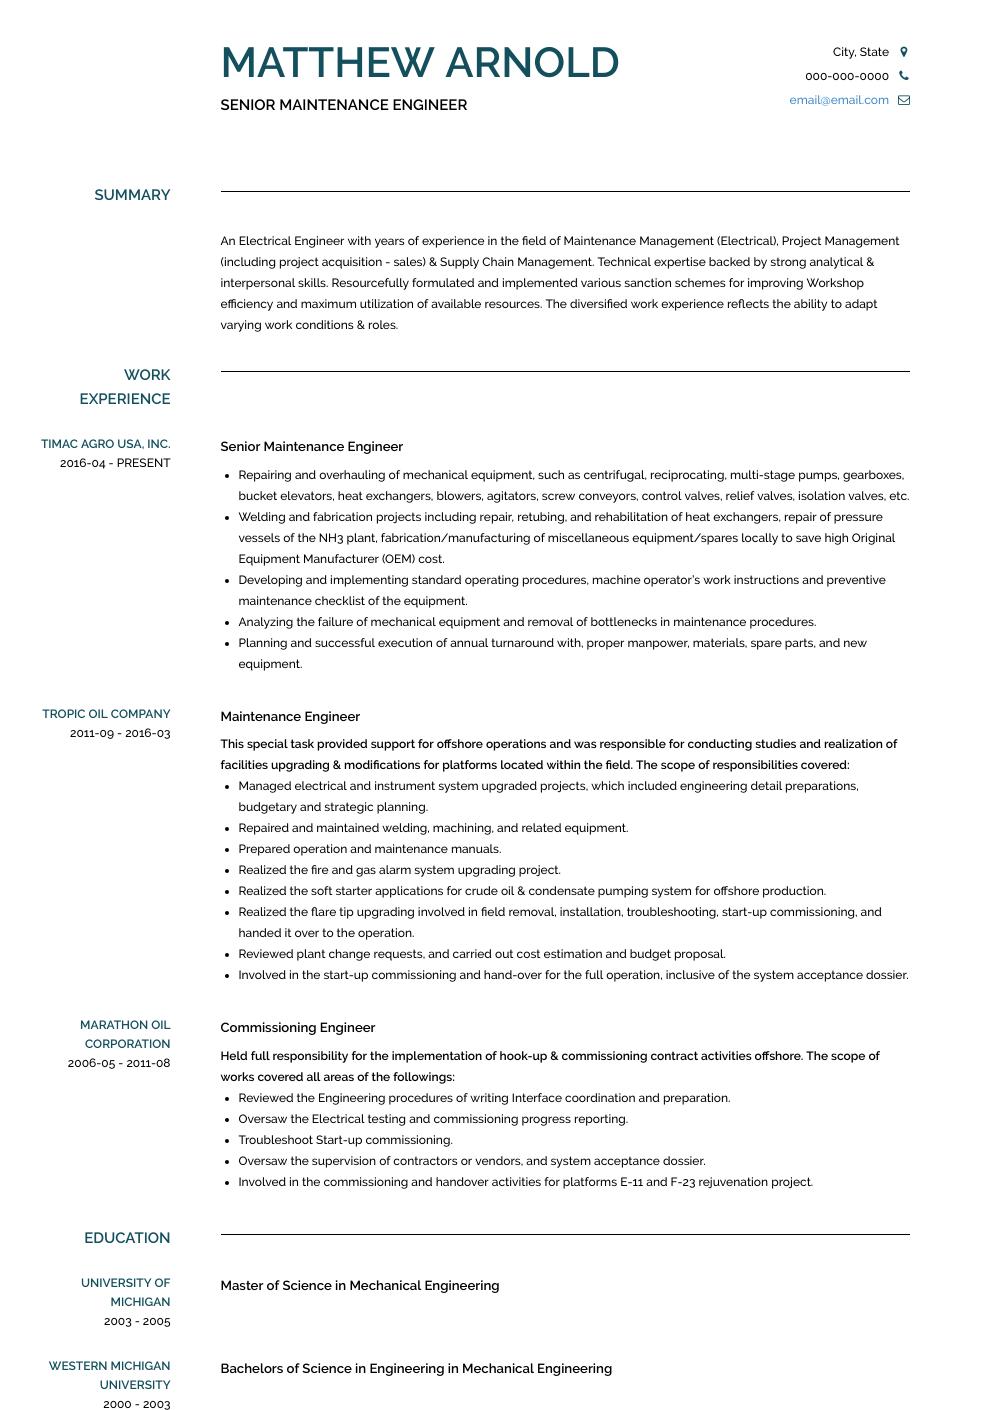 Maintenance Engineer - Resume Samples & Templates   VisualCV